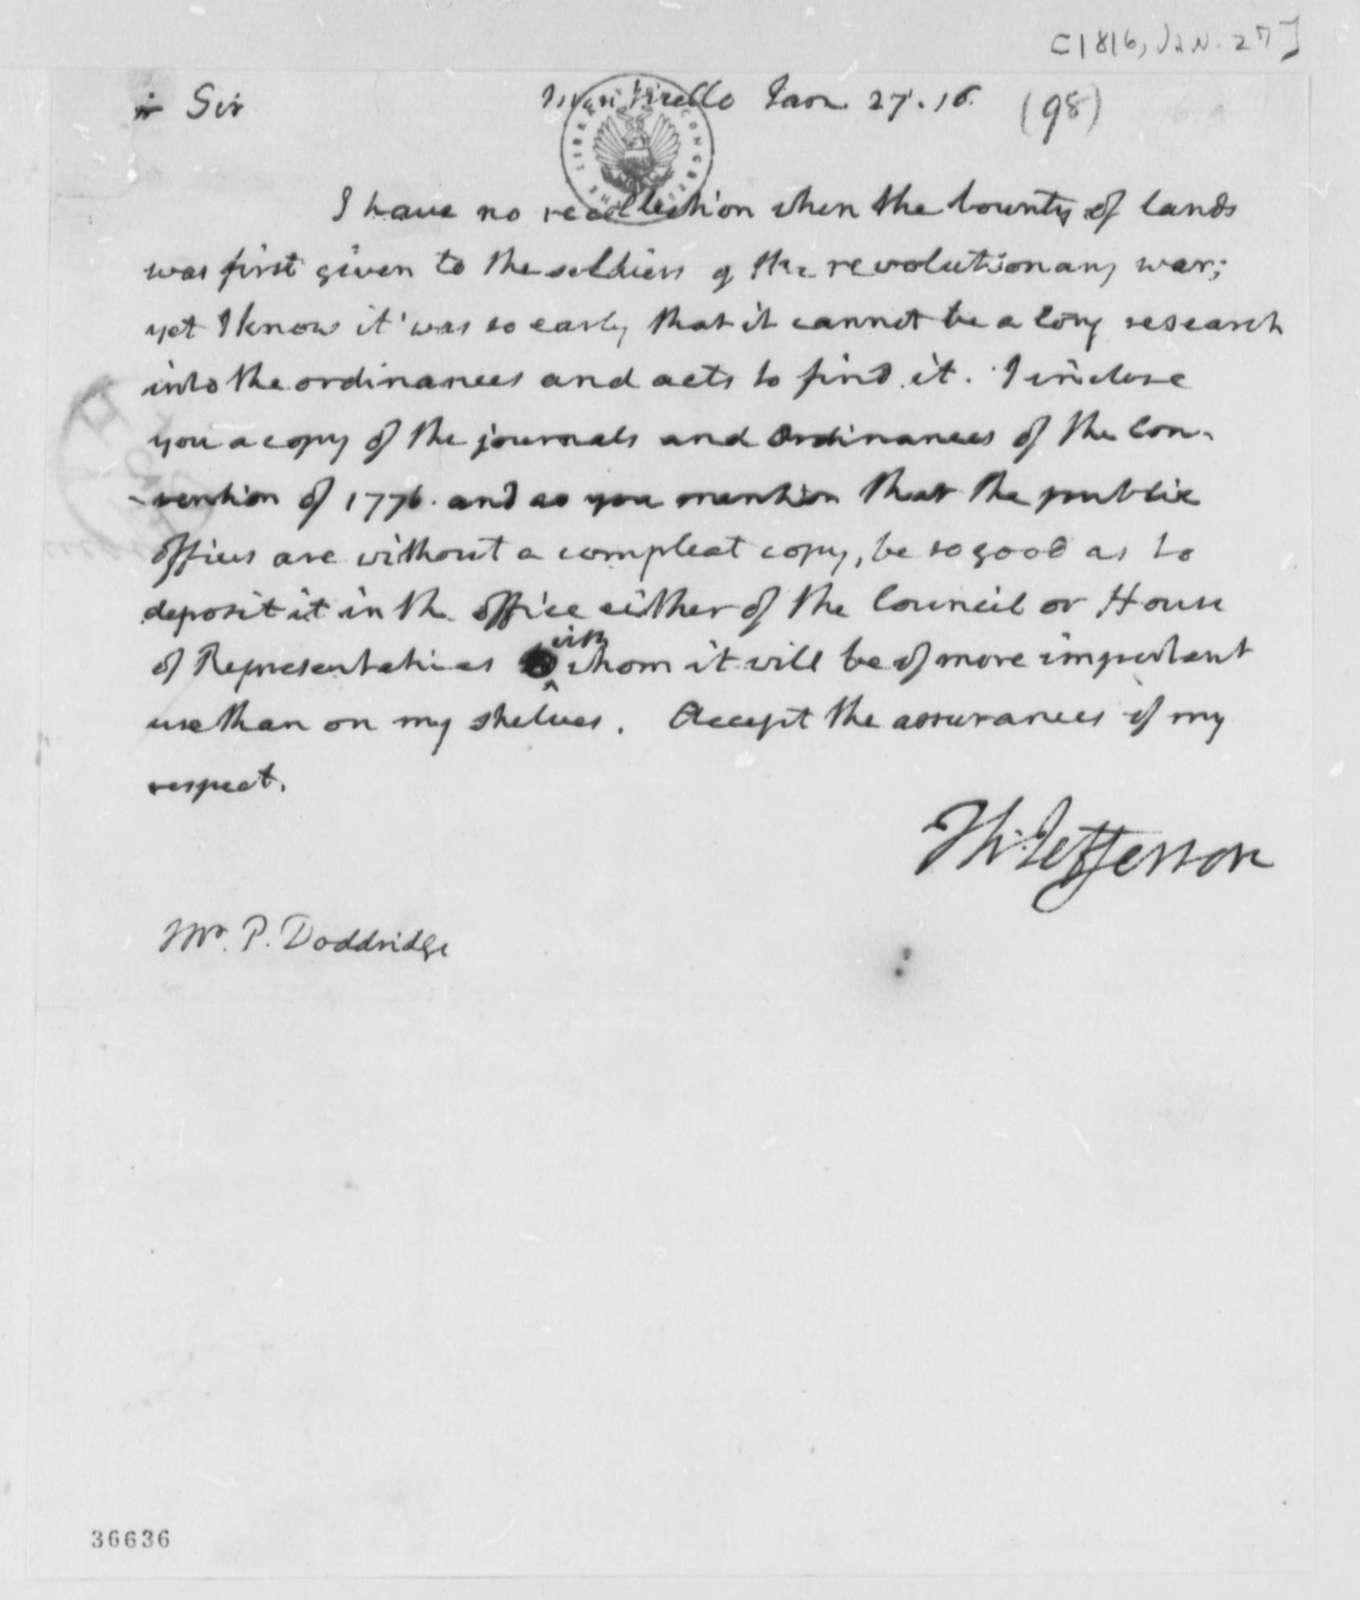 Thomas Jefferson to P. Doddridge, January 27, 1816